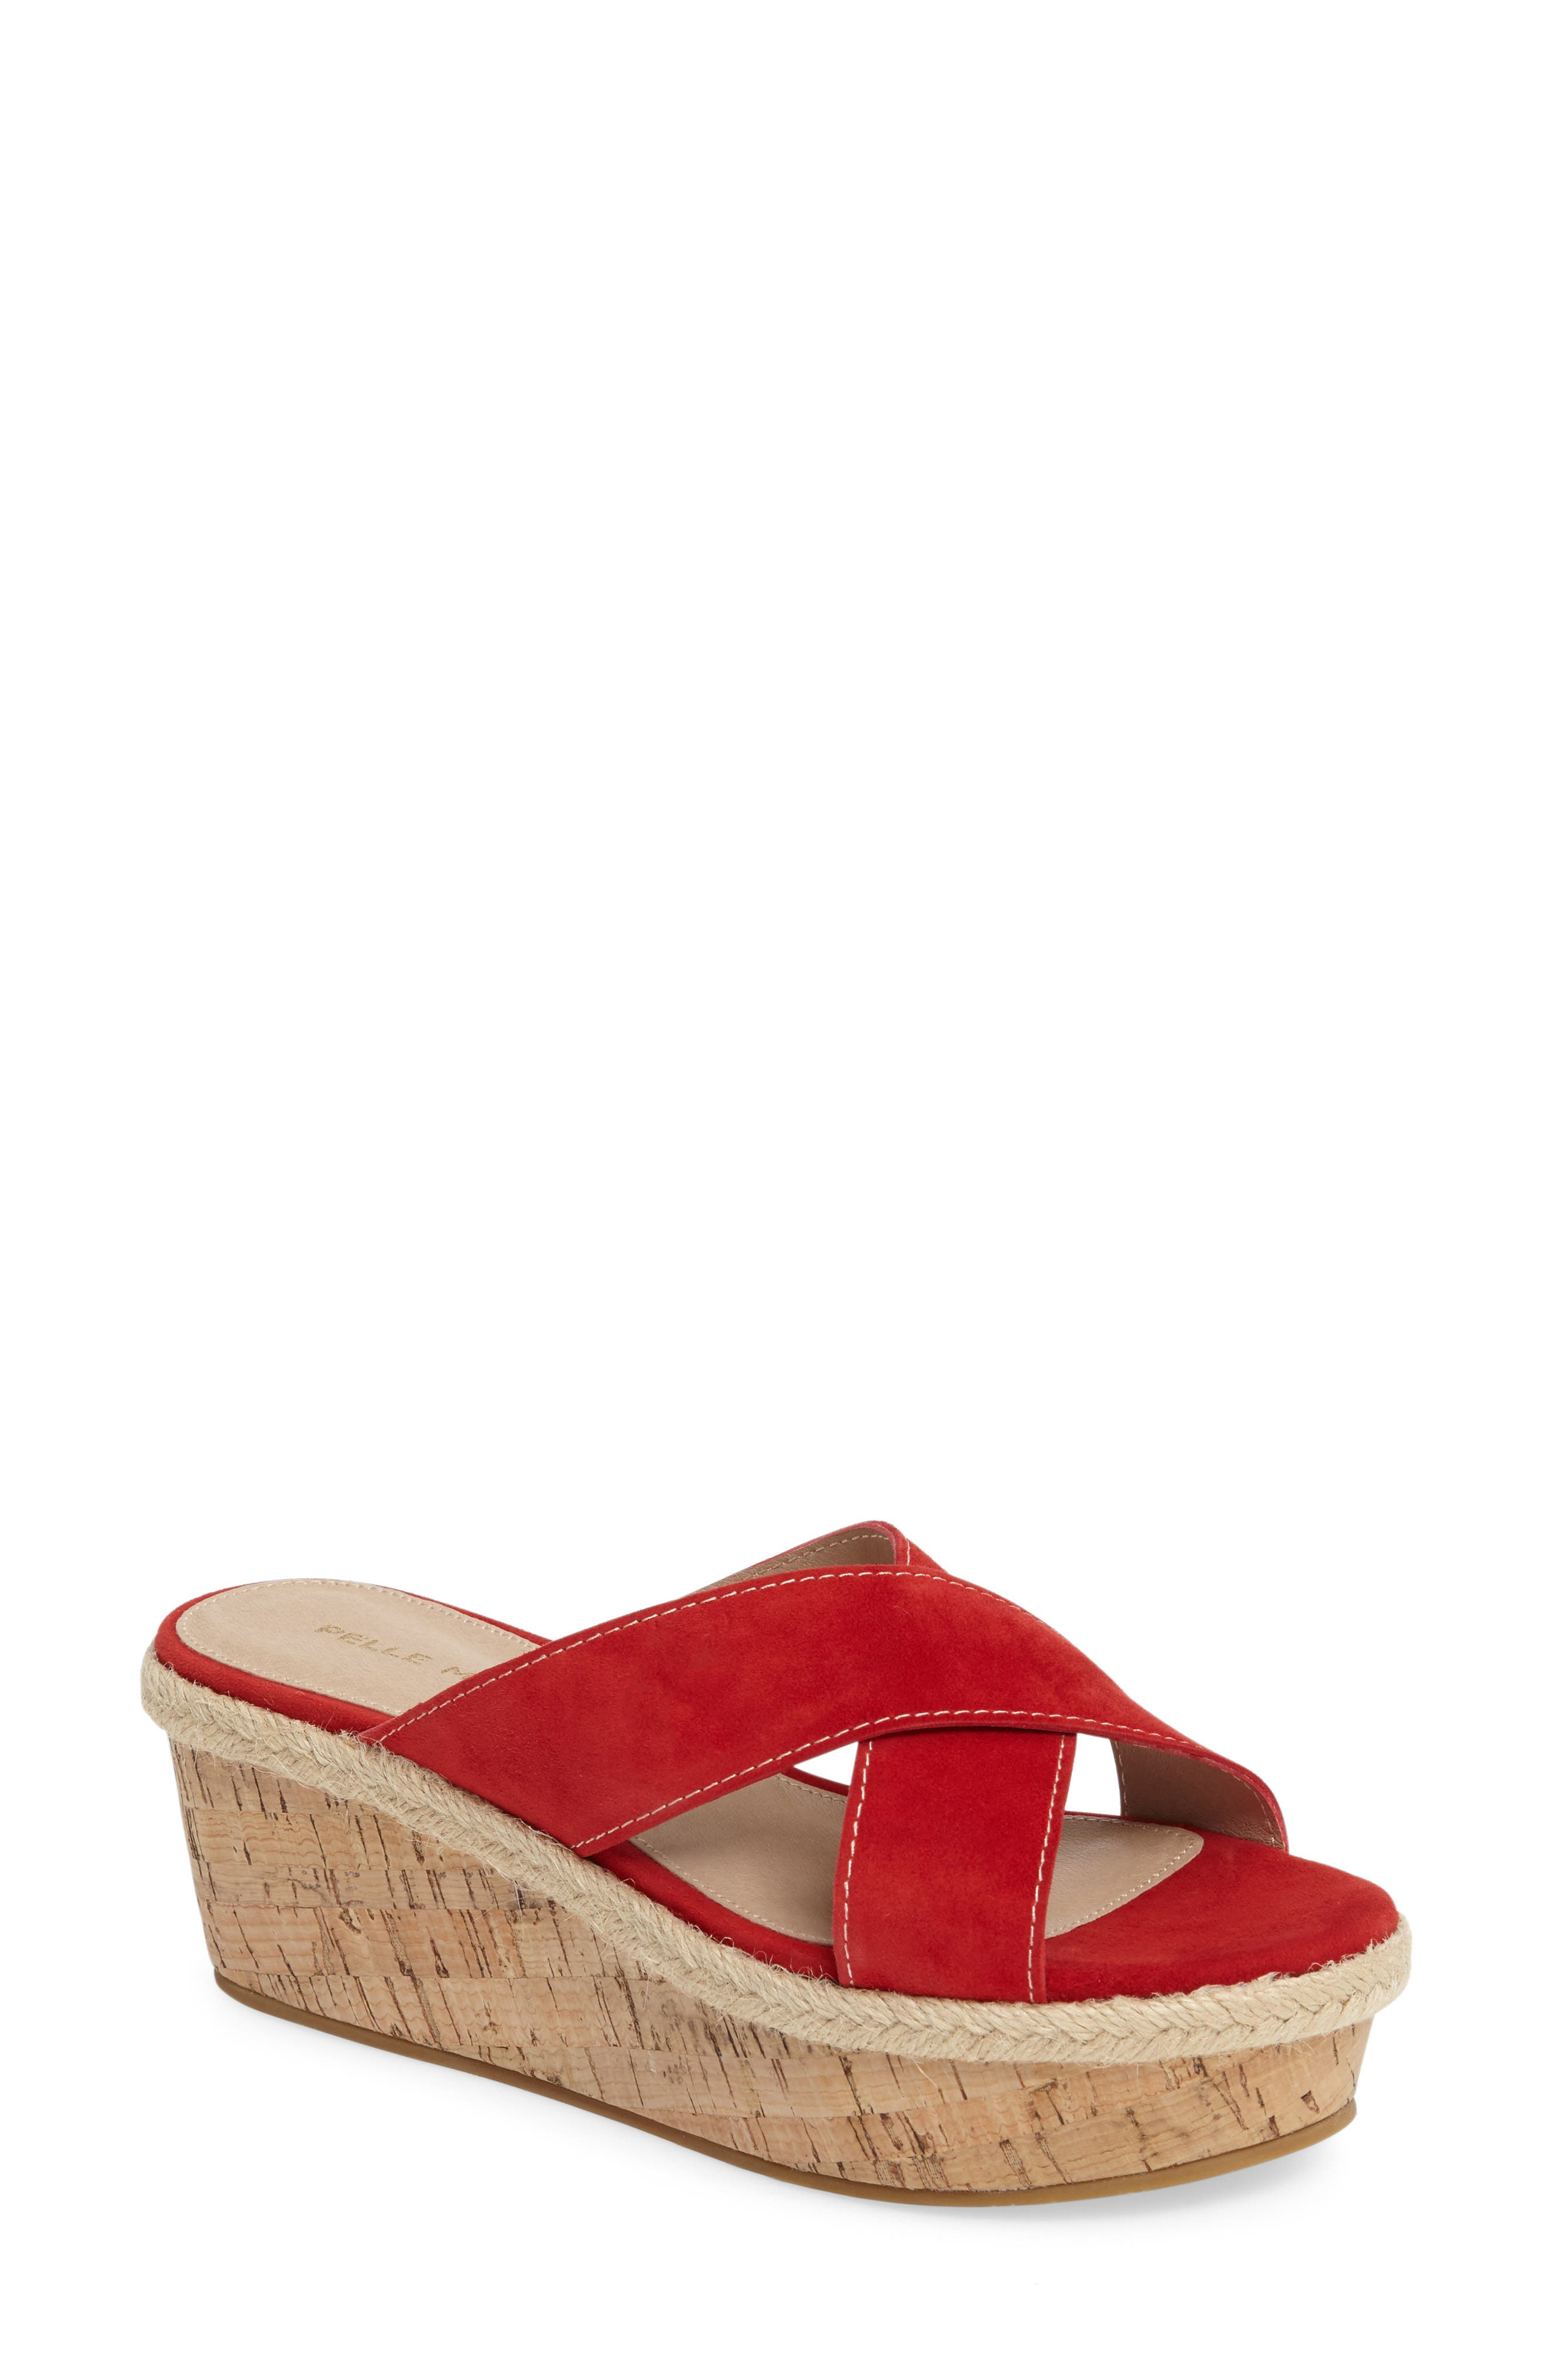 Harriet Platform Wedge Sandal,                             Main thumbnail 1, color,                             Lipstick Leather